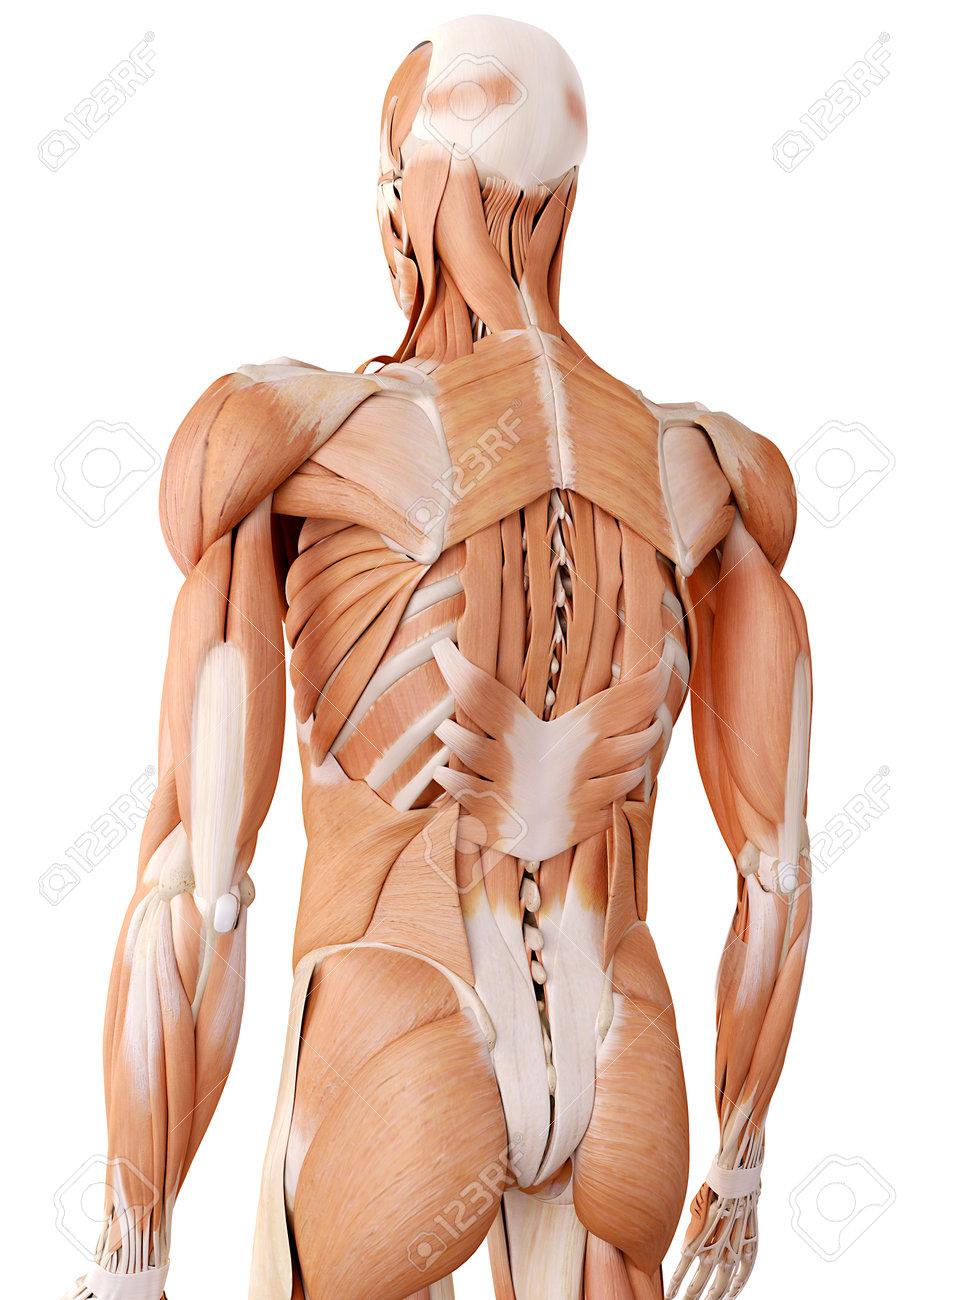 Medizinisch Genaue Anatomie Illustration - Rückenmuskulatur ...